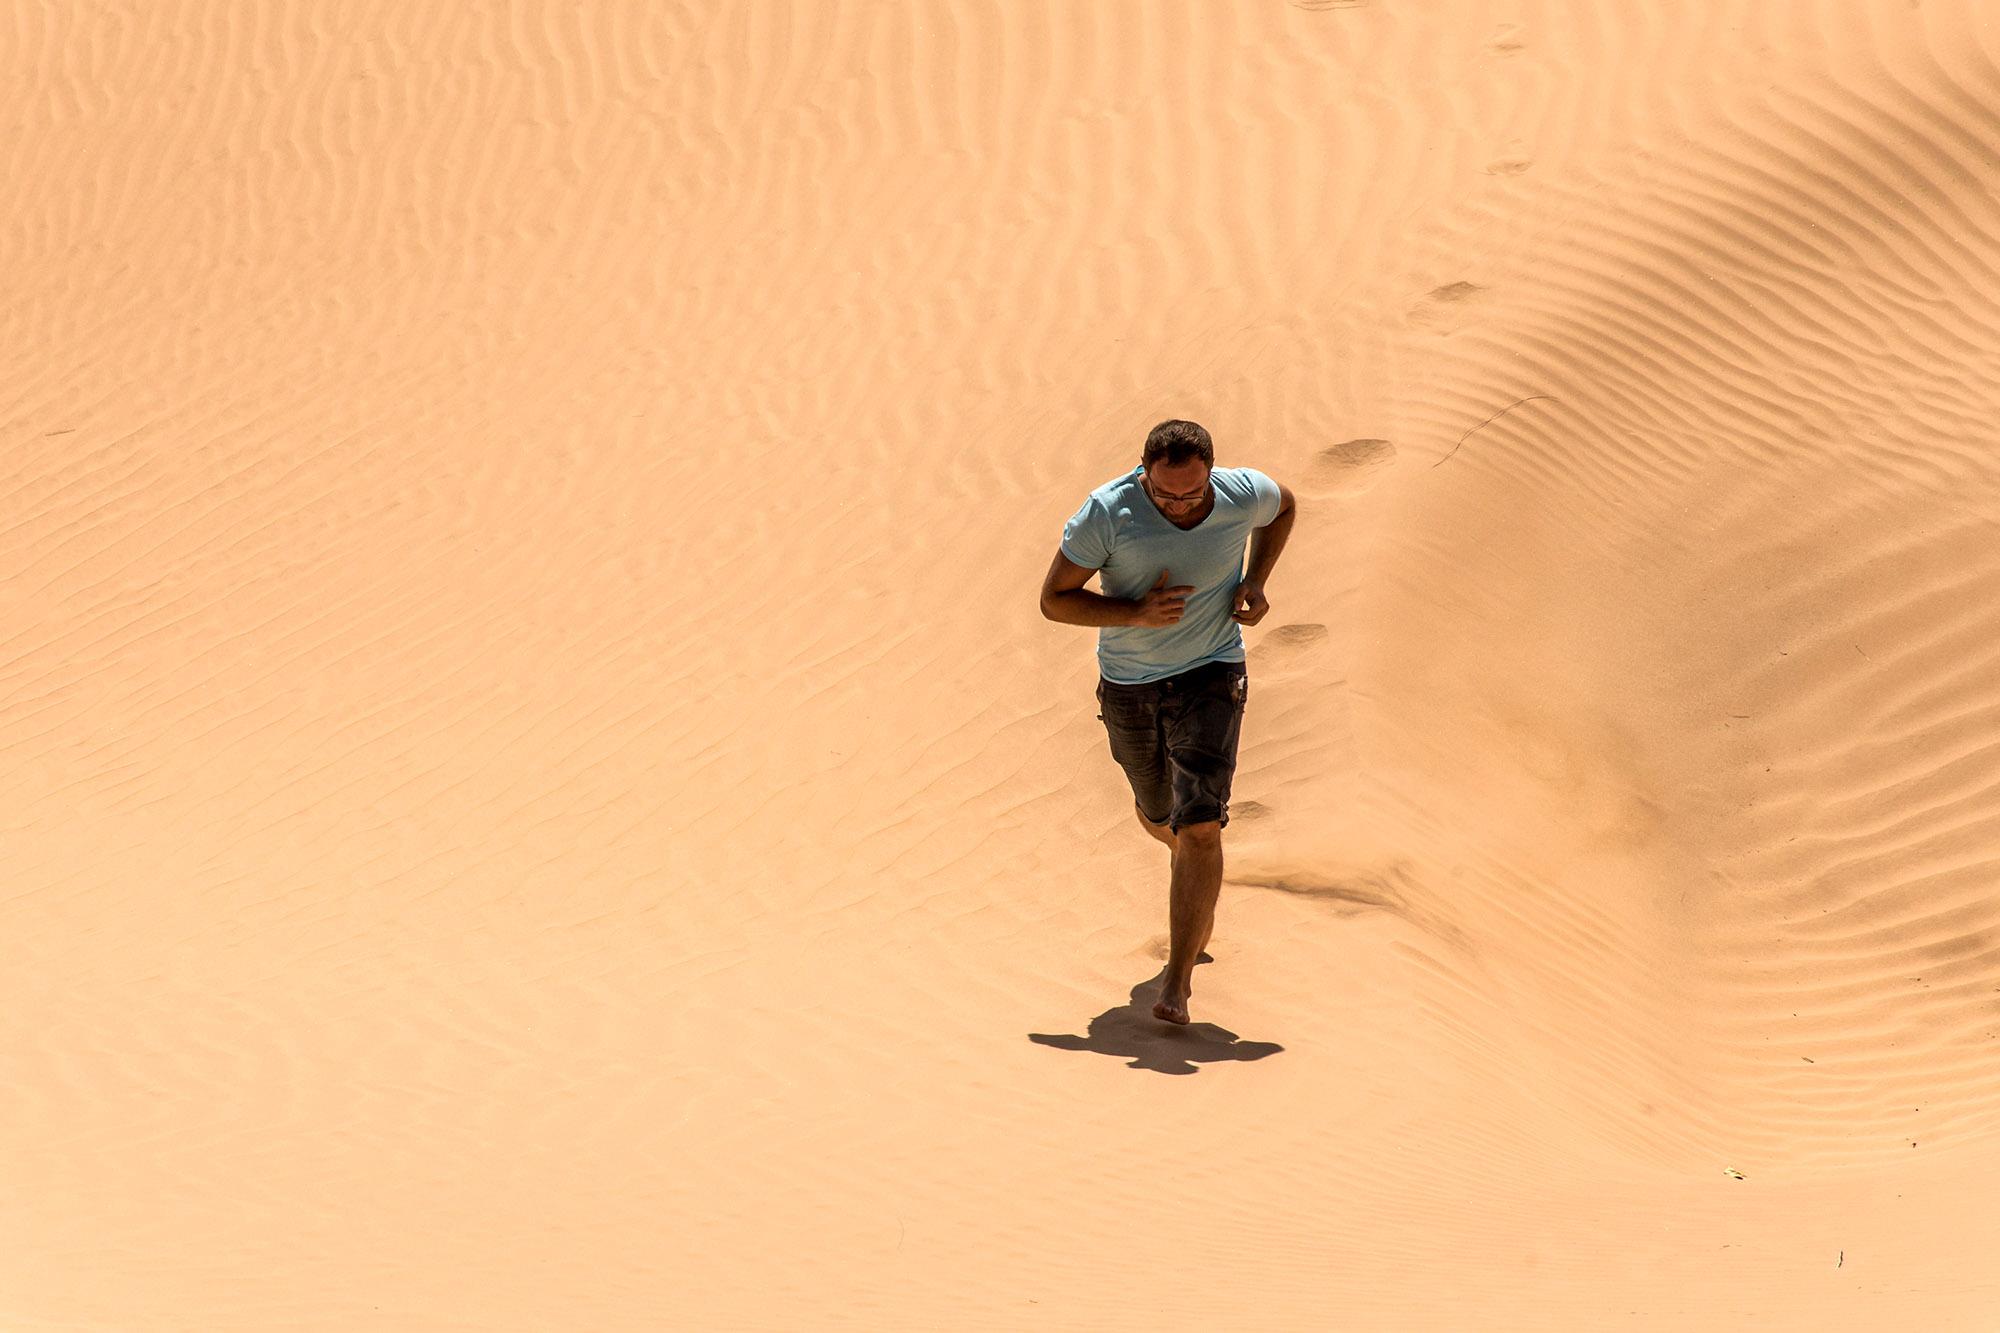 Man tourist in desert rub al khali in Oman running in sand 3